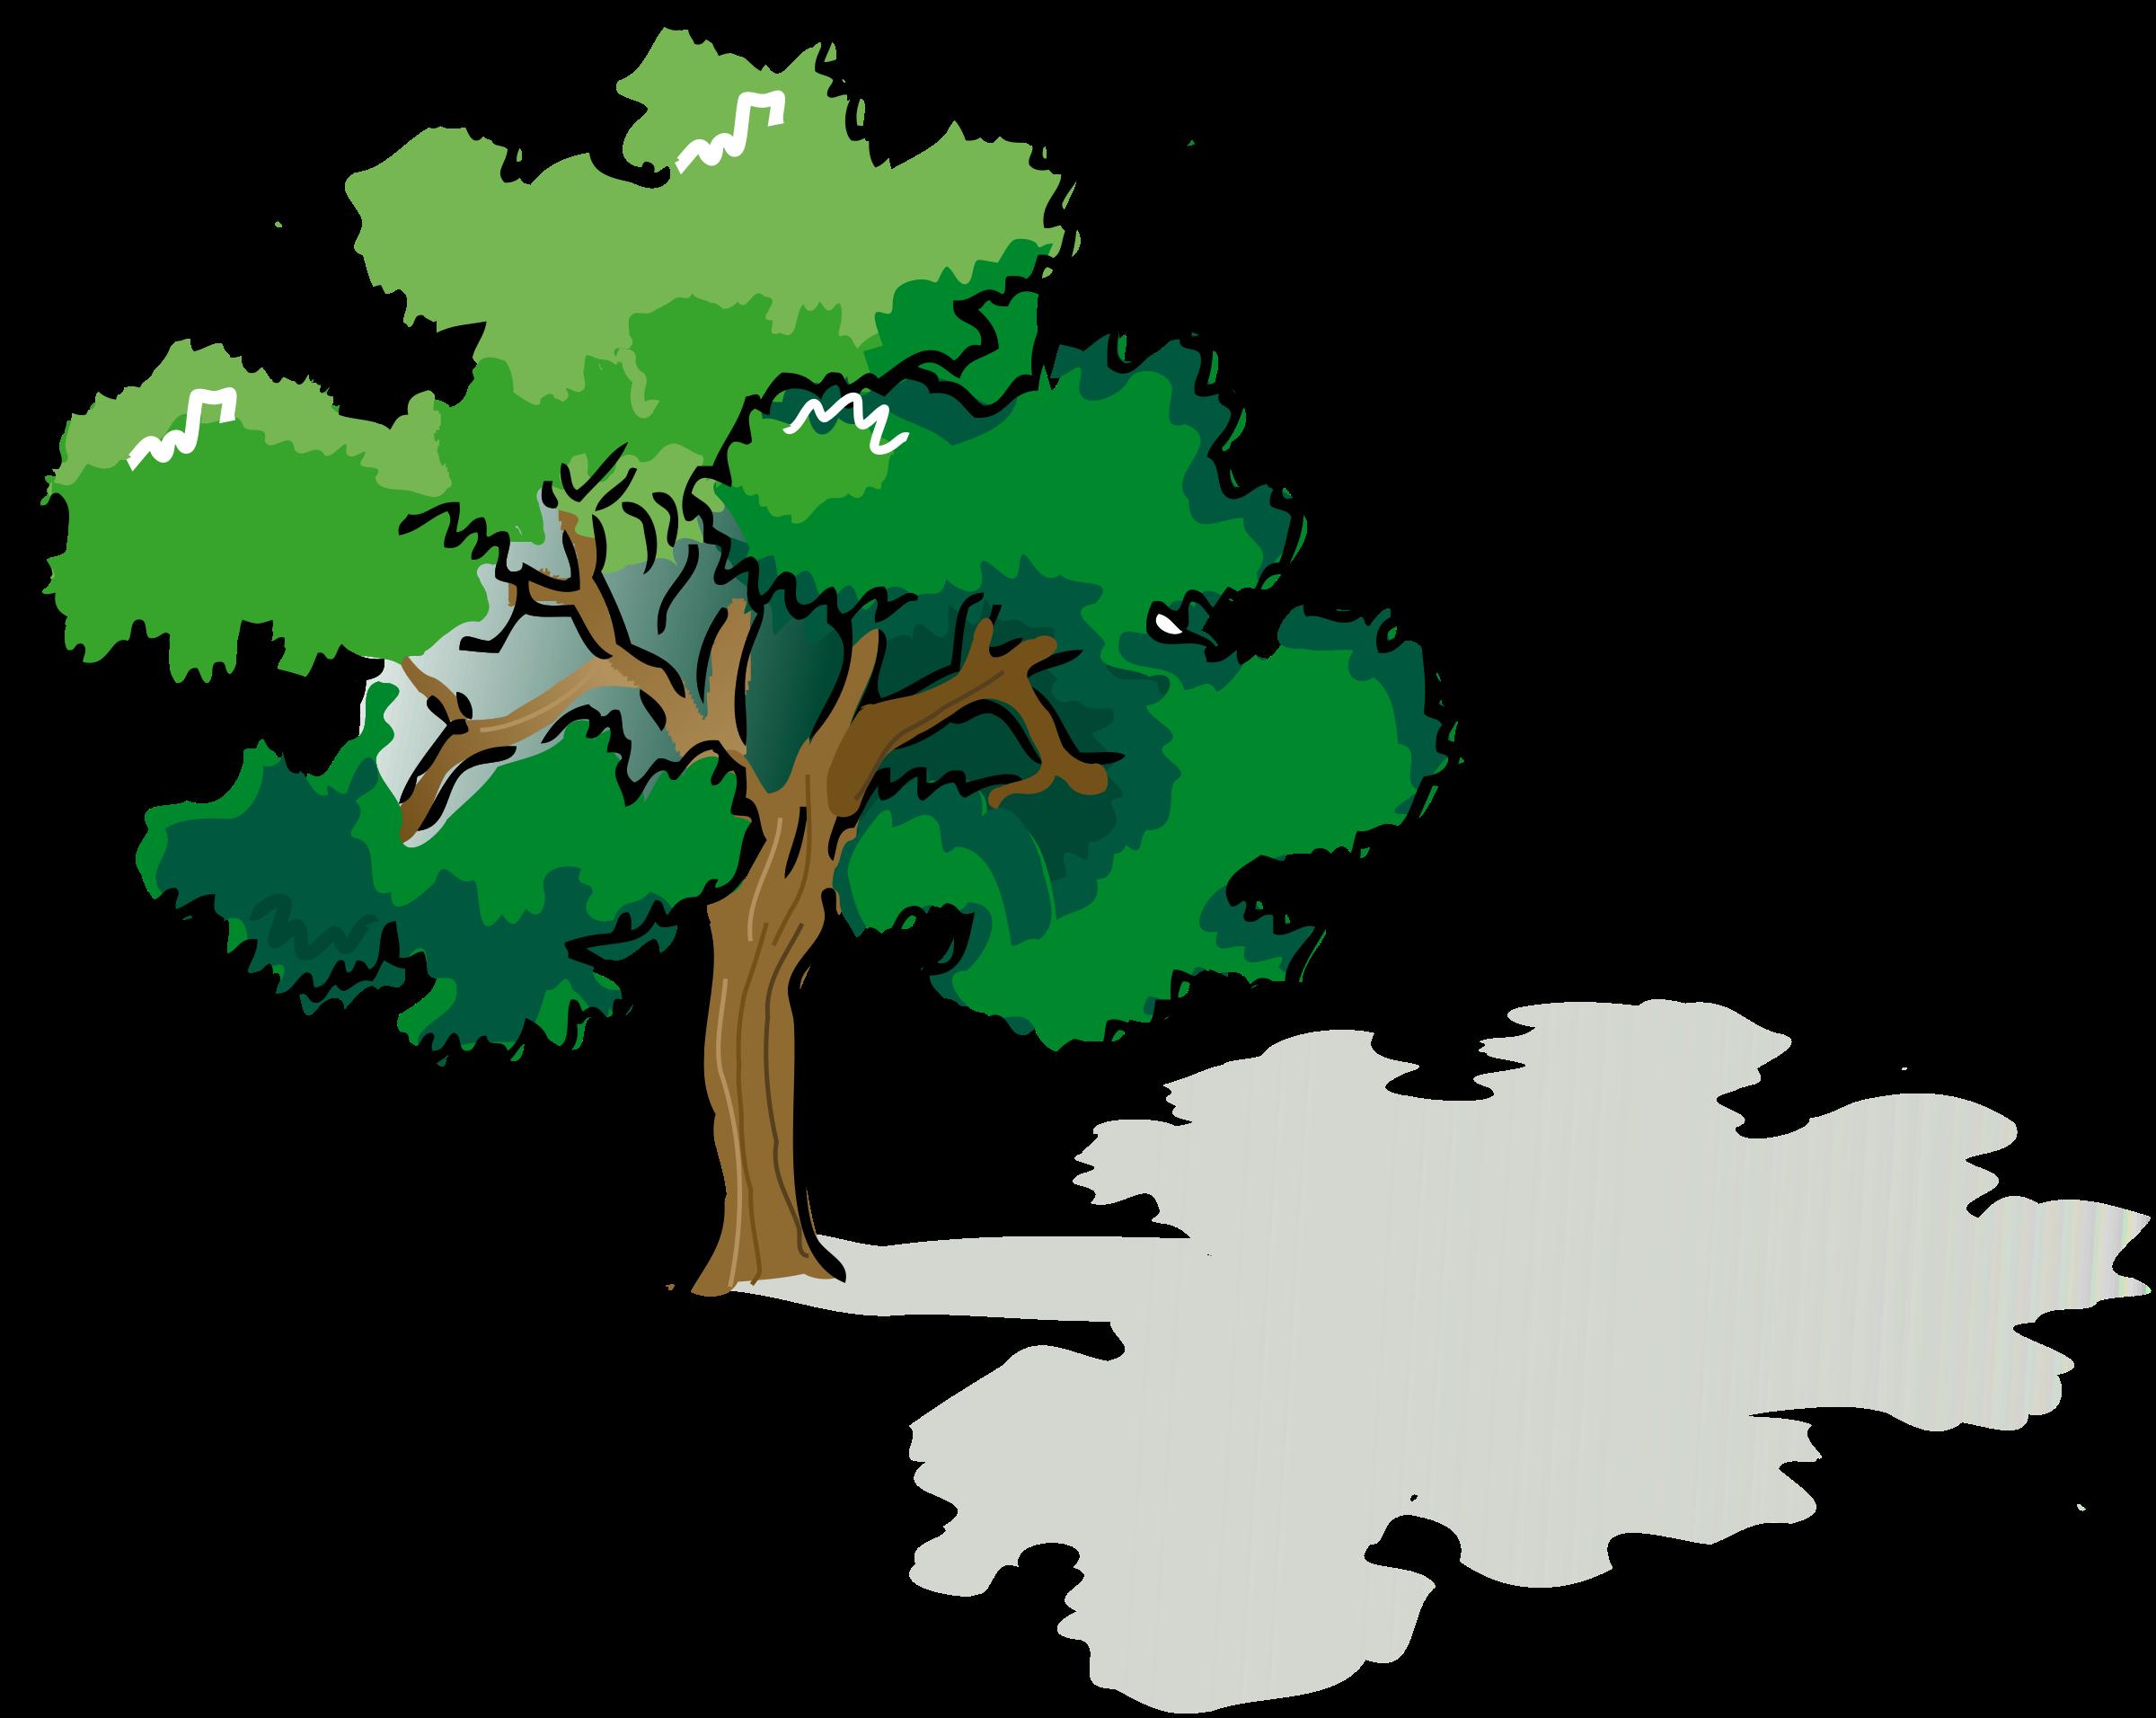 Clipart trees rainforest. Narra png transparent images